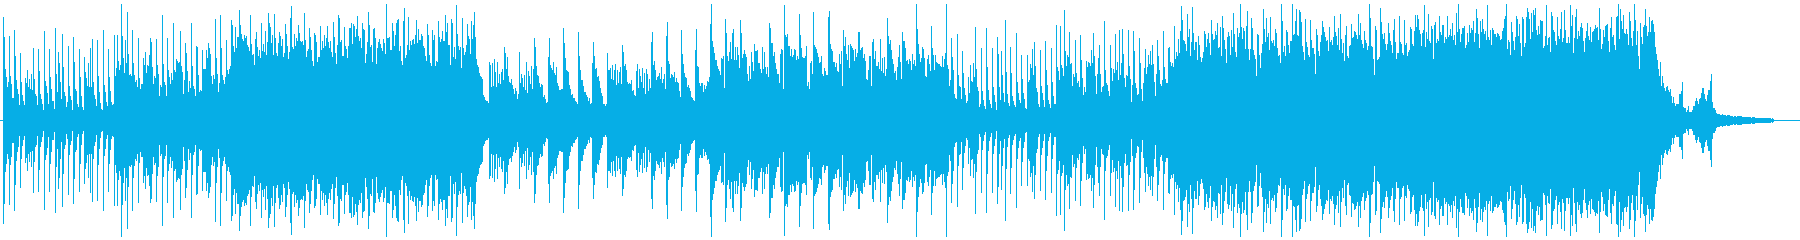 Mistrain / Jingle's reproduced waveform